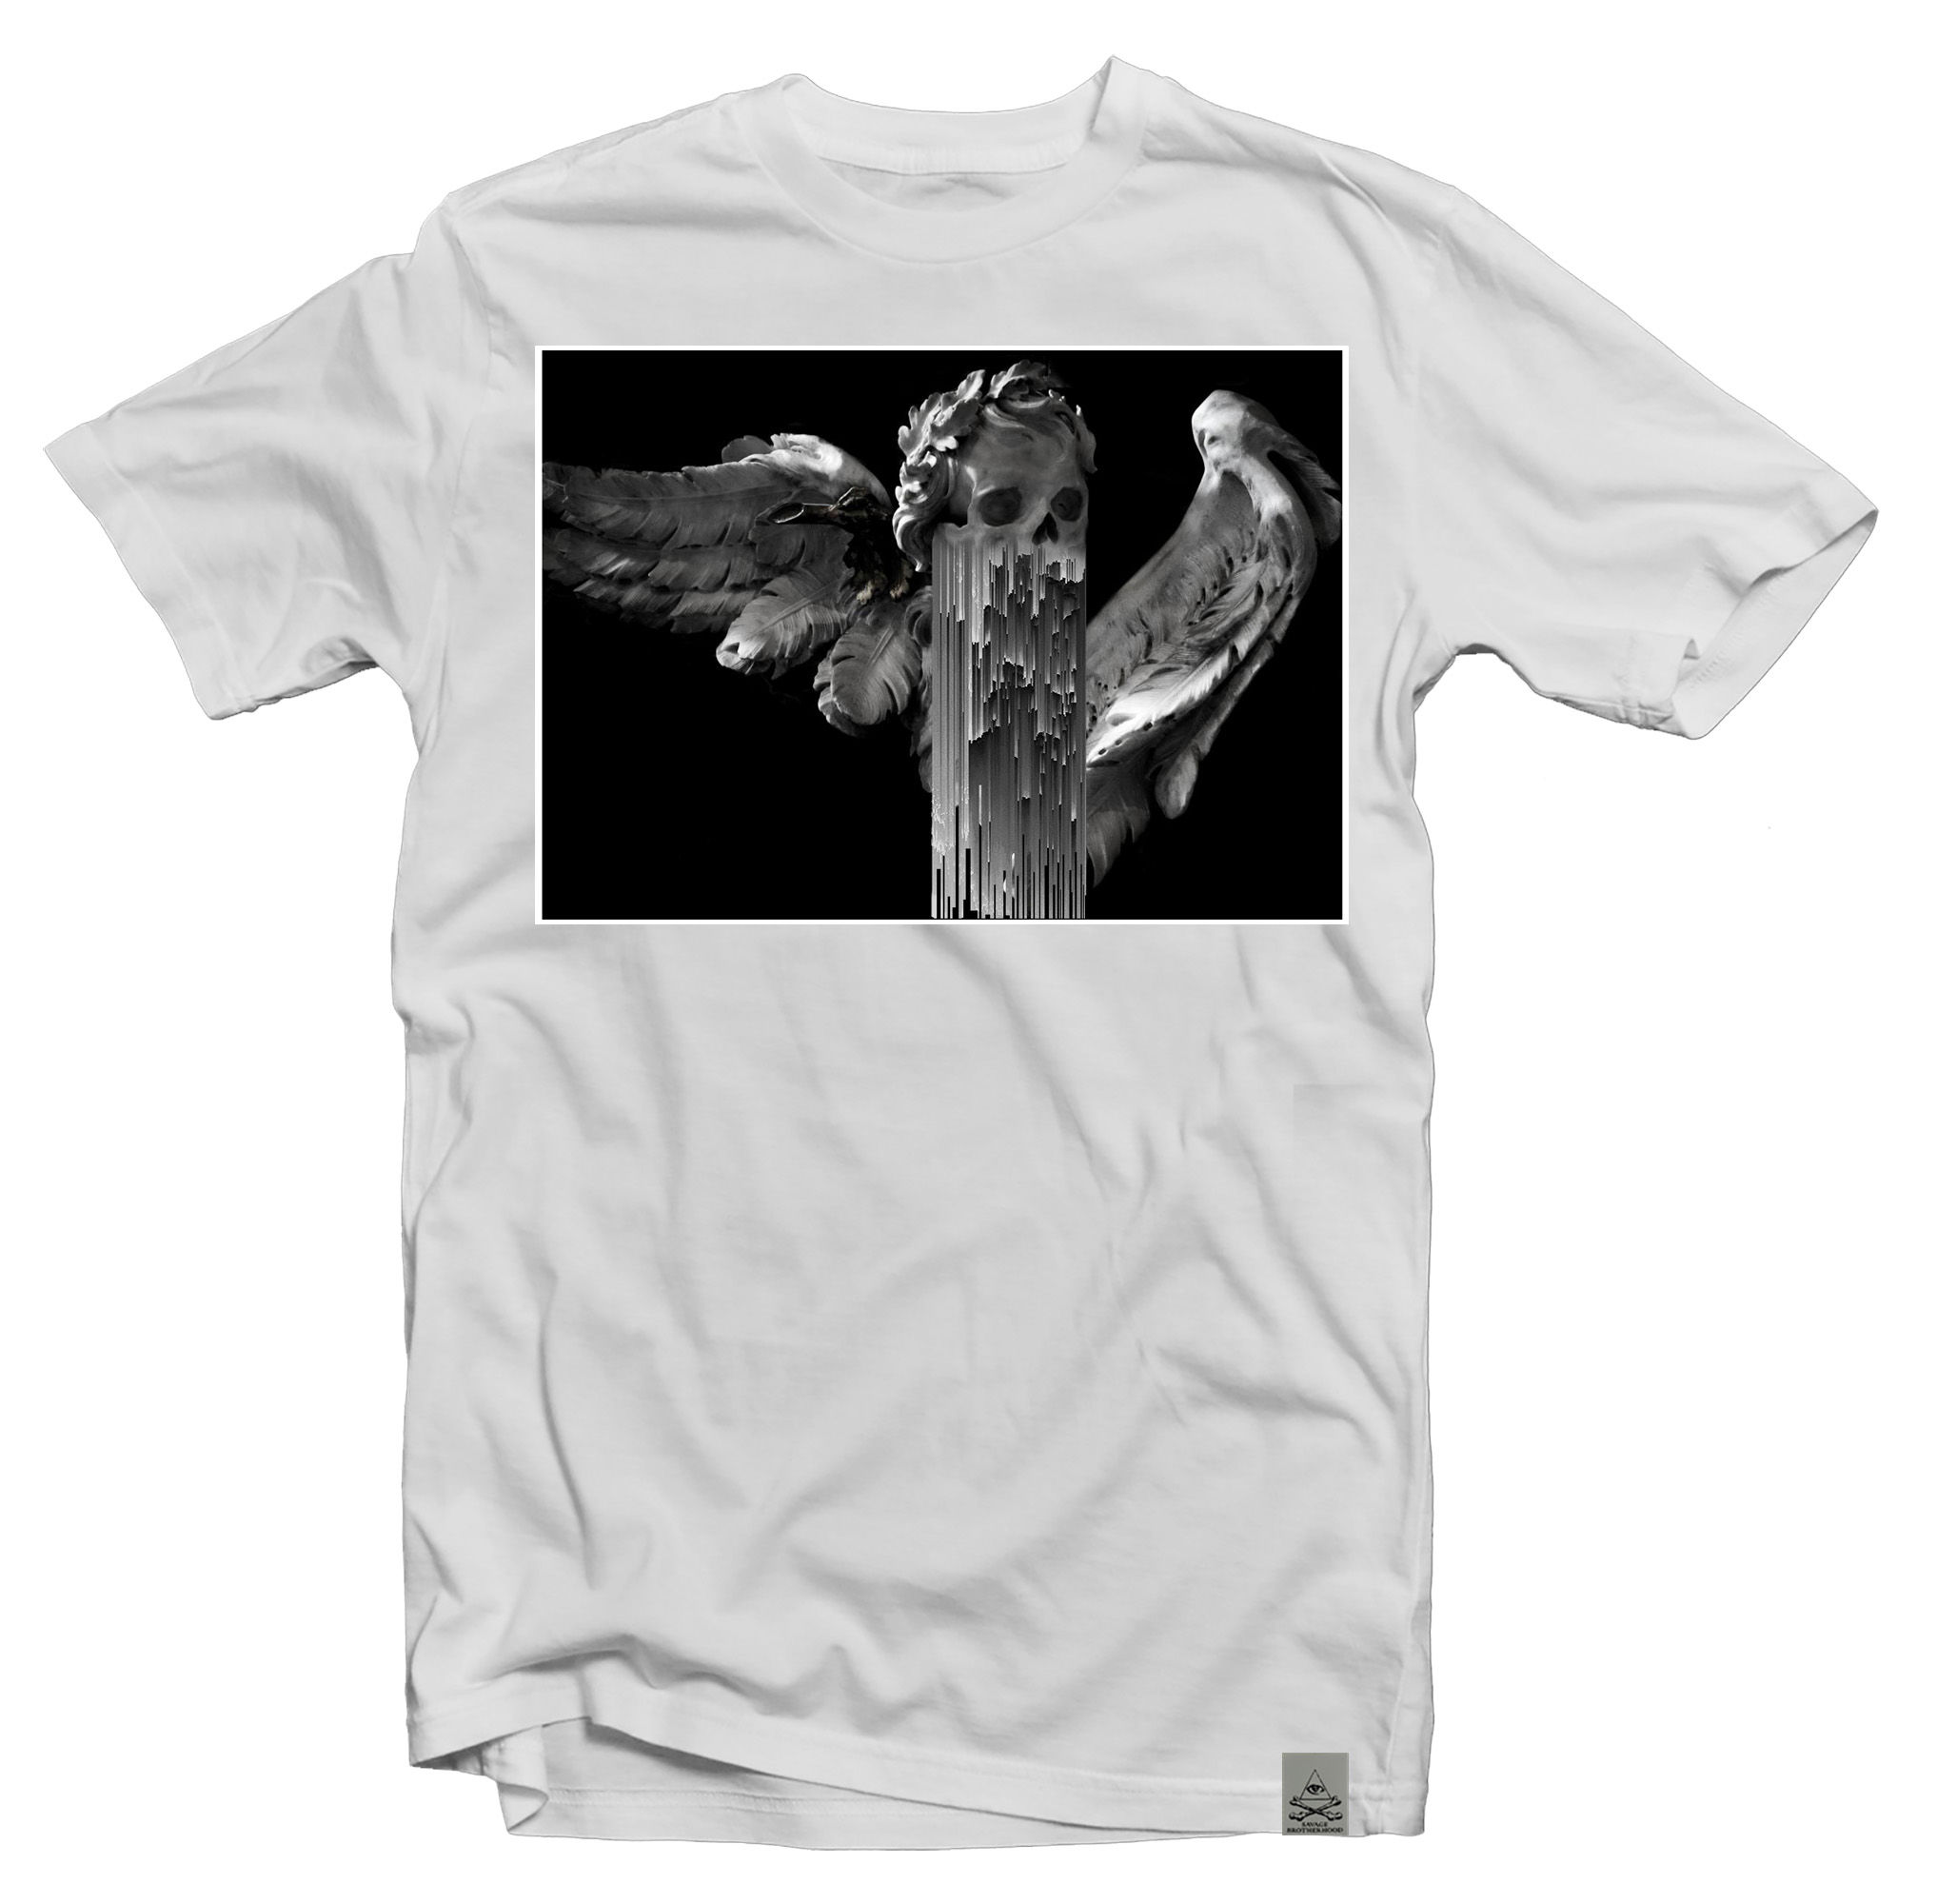 1_1486082084629_death of an angel.jpg